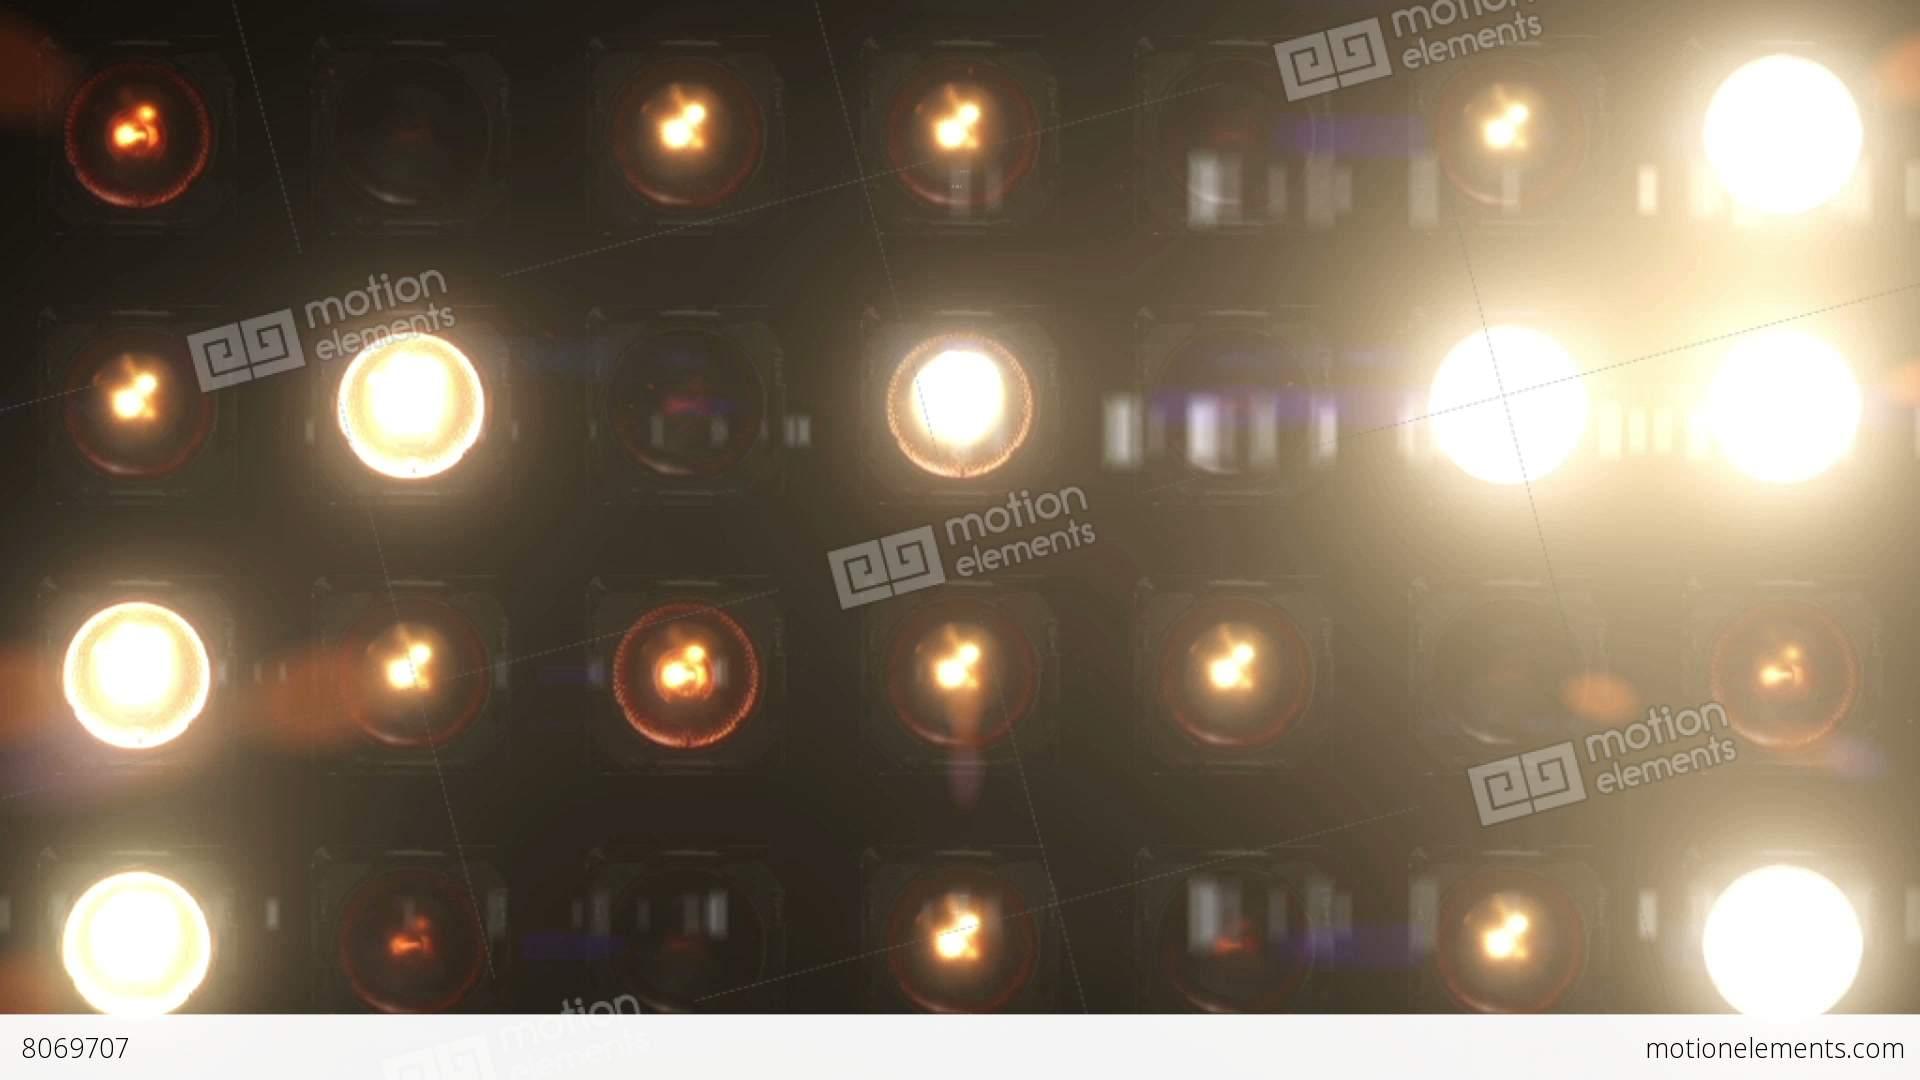 Flashing lights bulb wall of lights vj stage animacin 8069707 flashing lights bulb wall of lights vj stage videos de stock aloadofball Image collections